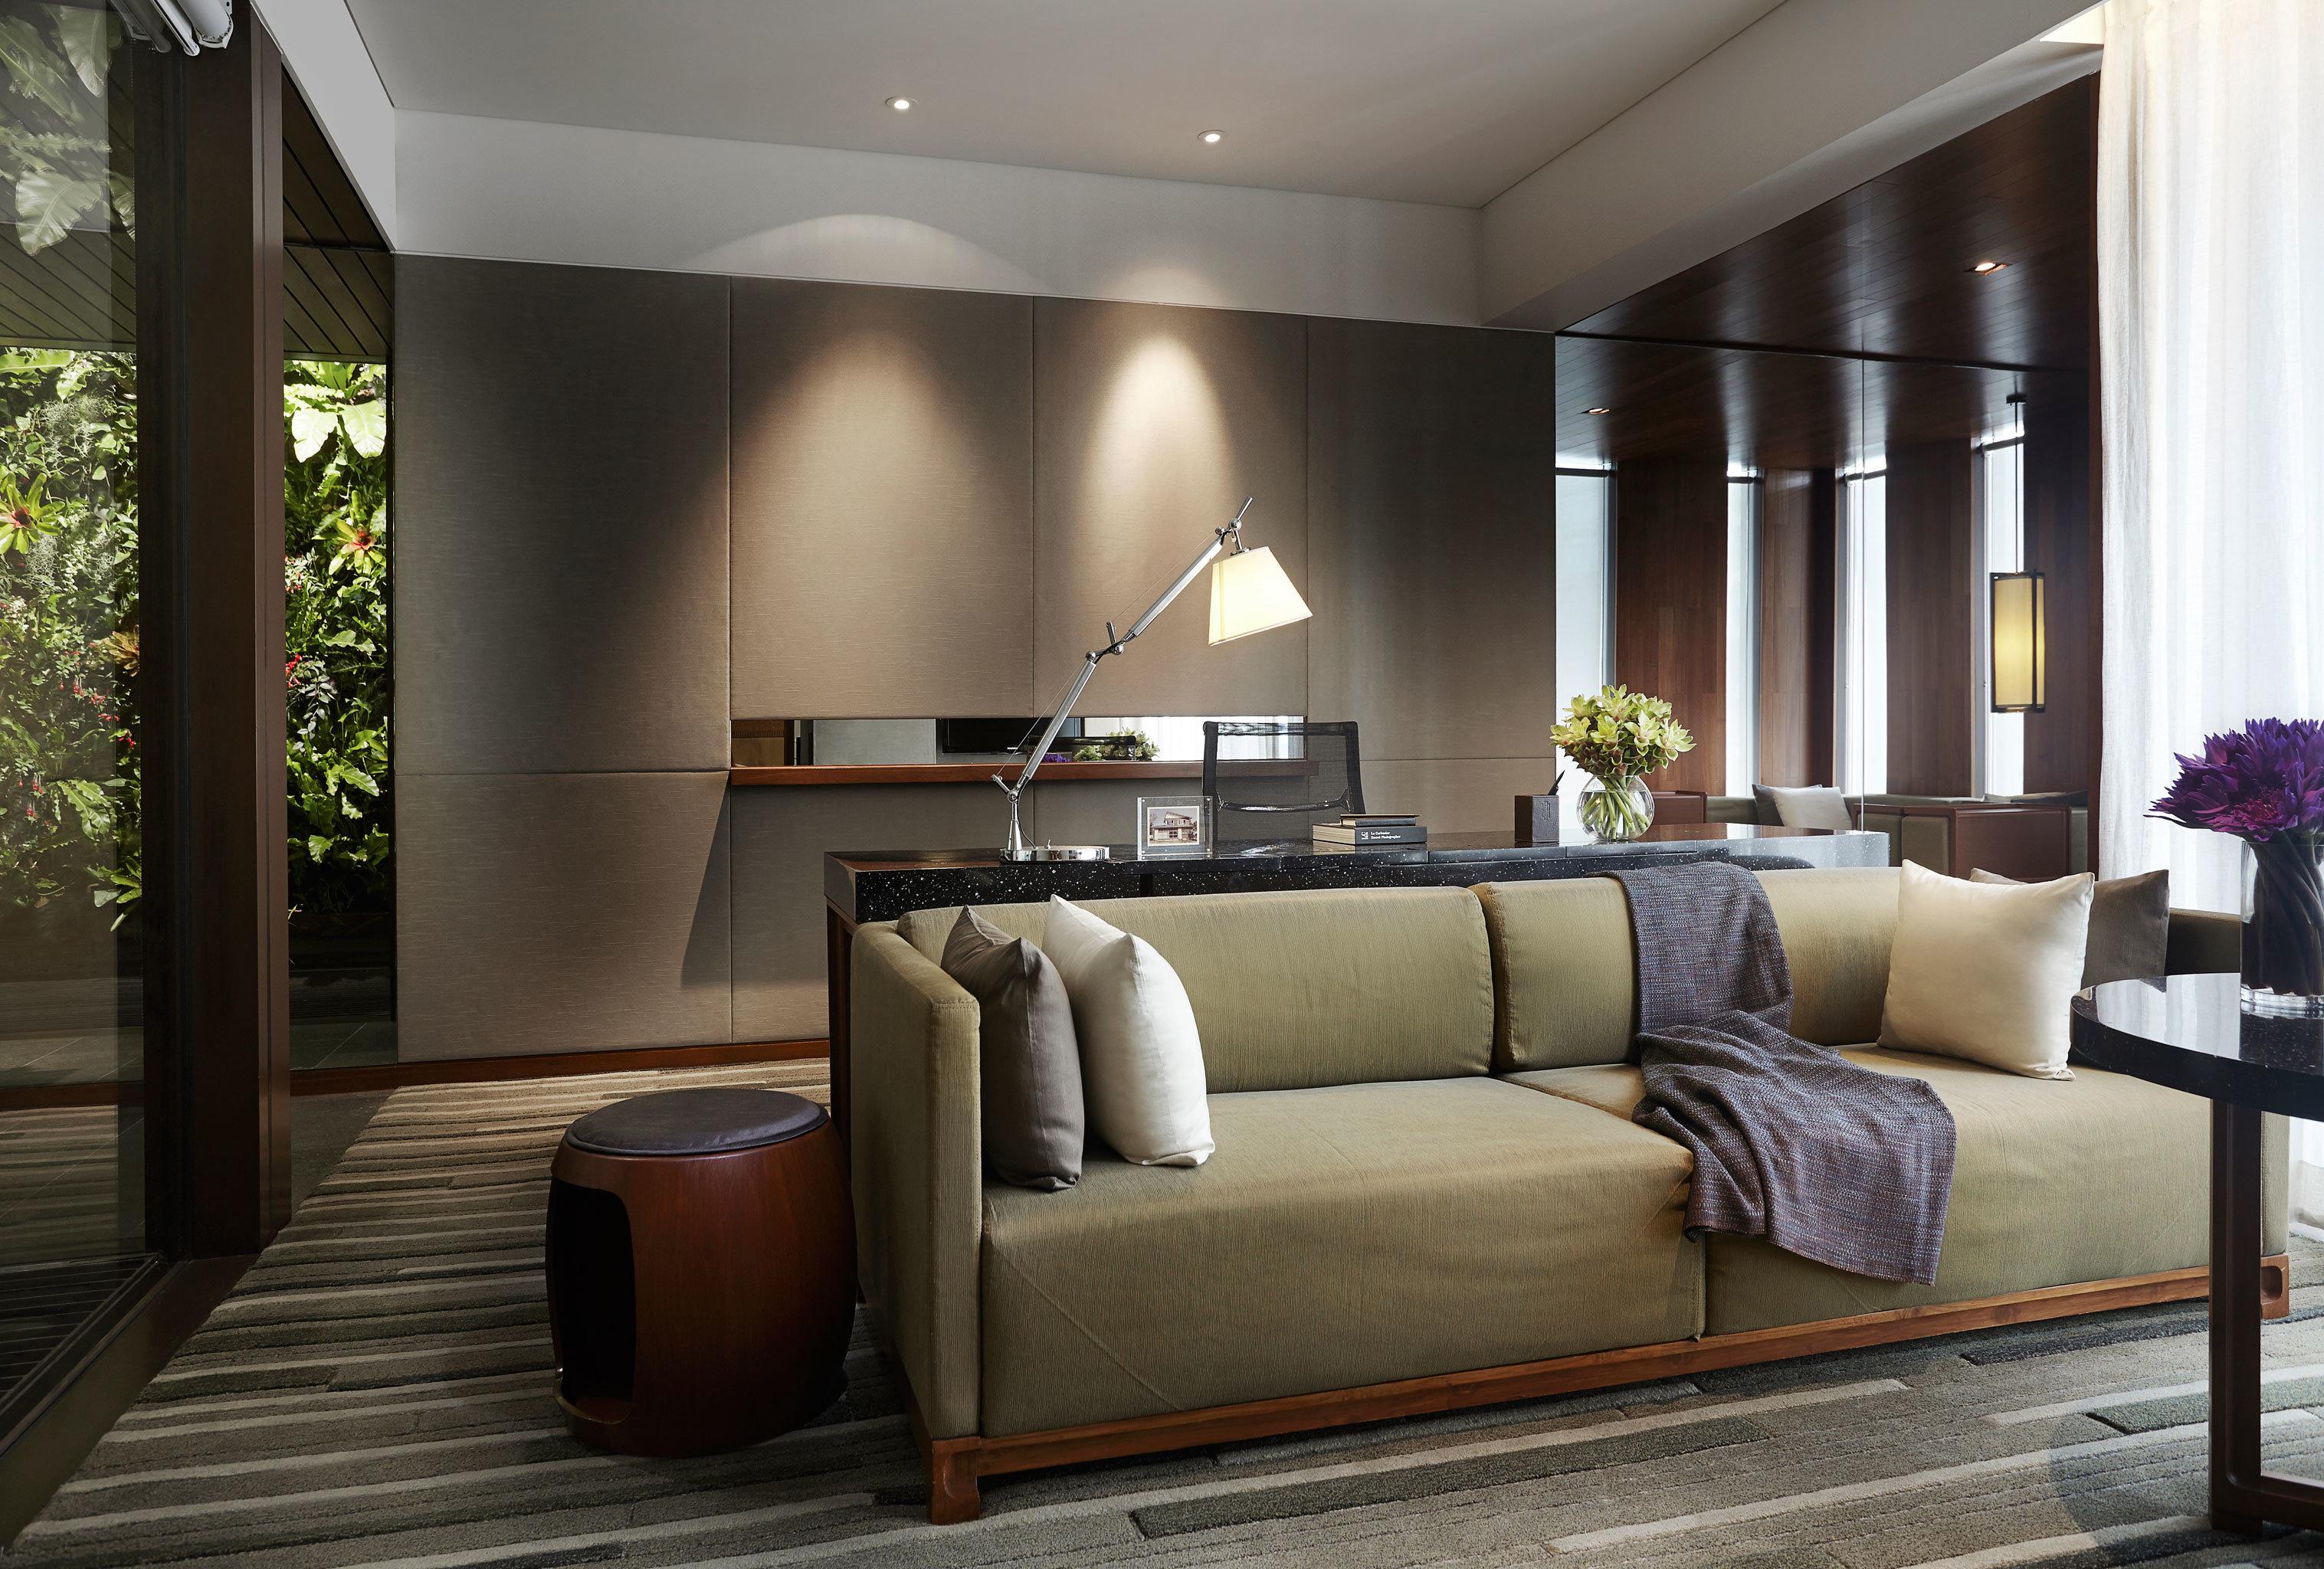 Lounge Luxury Modern sofa living room property home Lobby condominium nice Suite